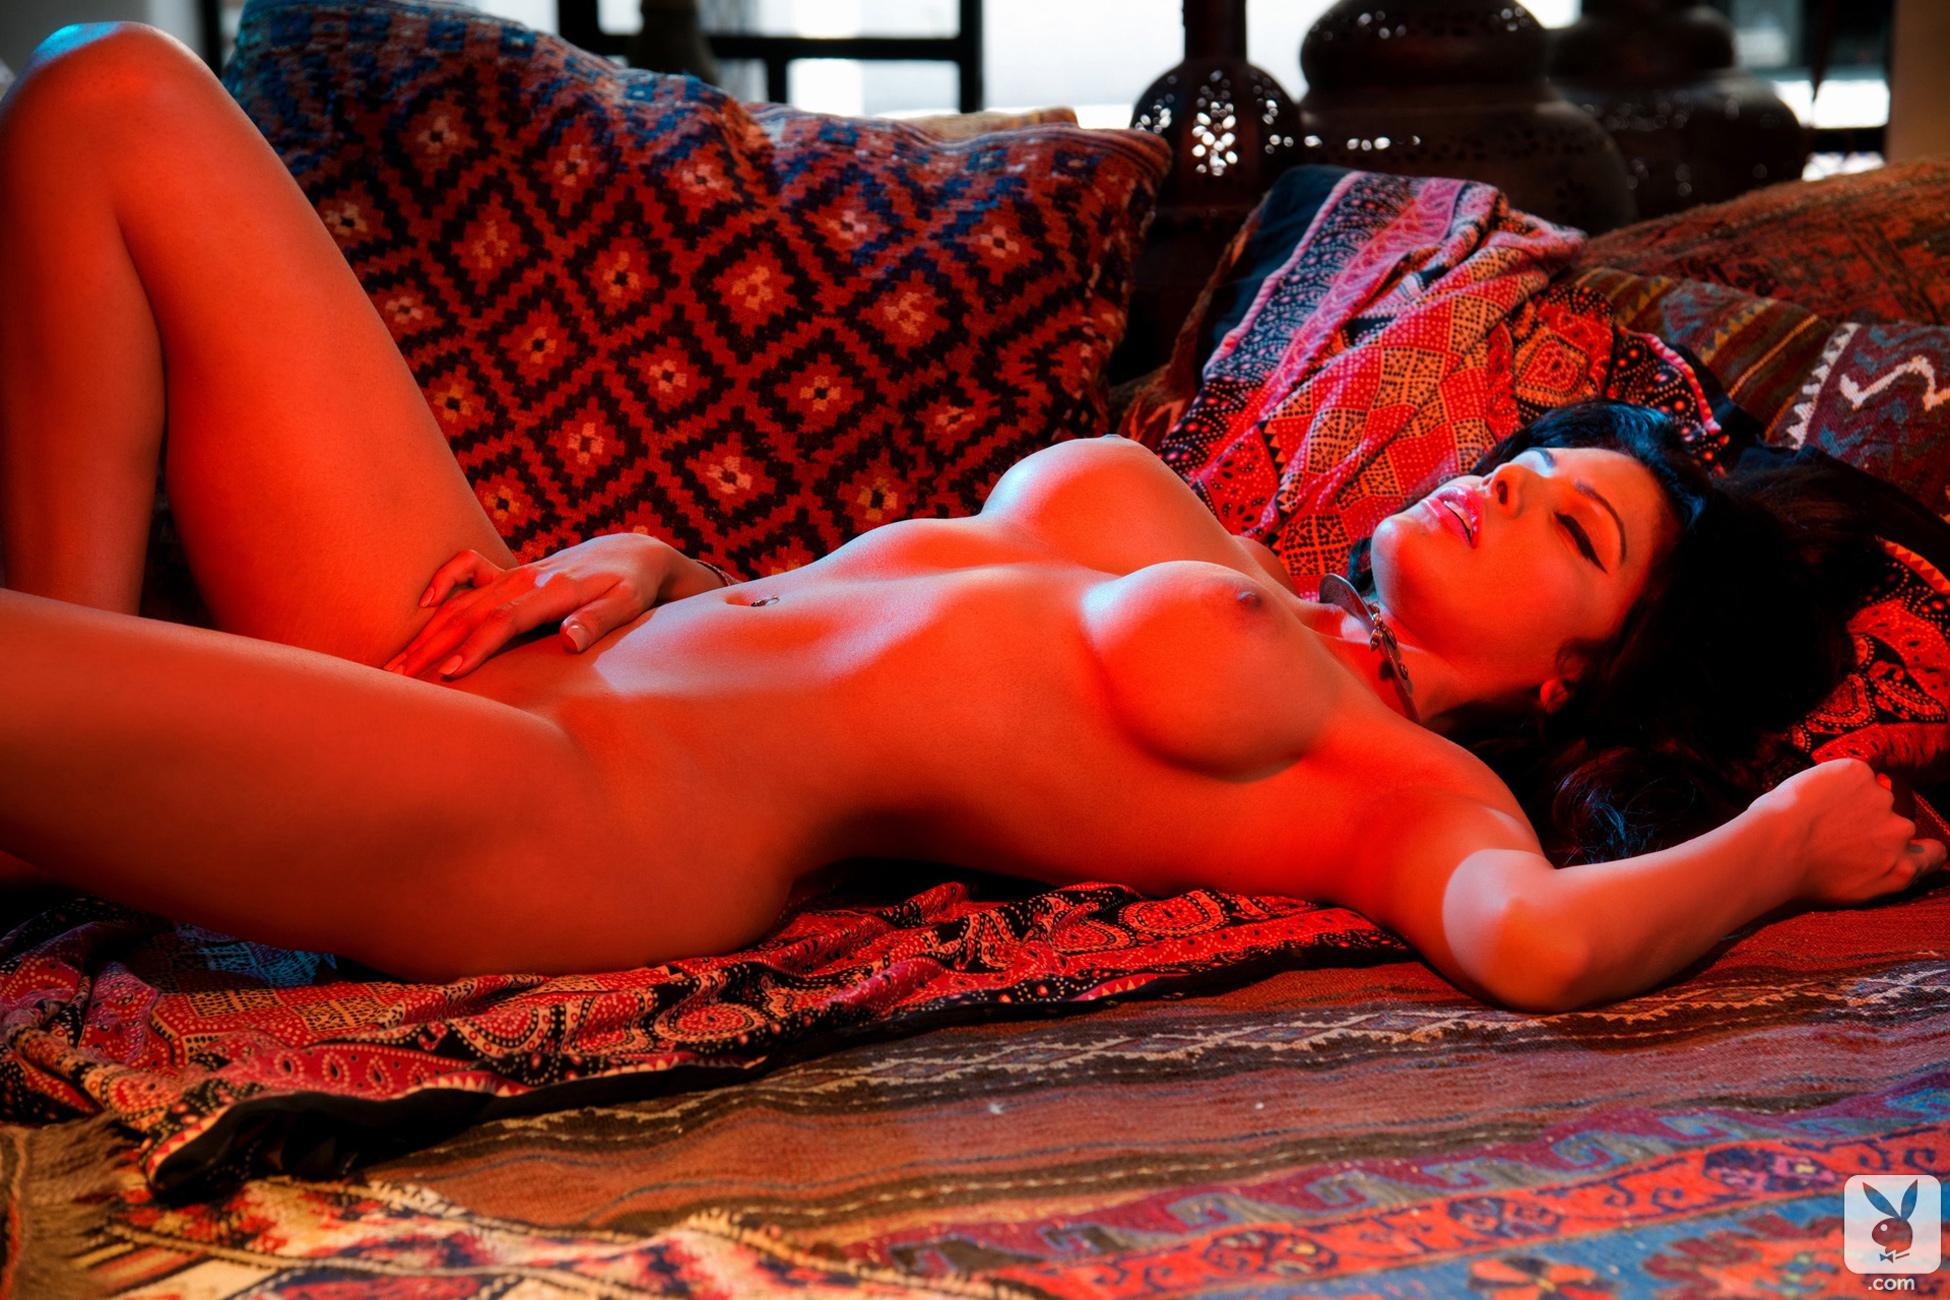 sherlyn chopra naked in playboy